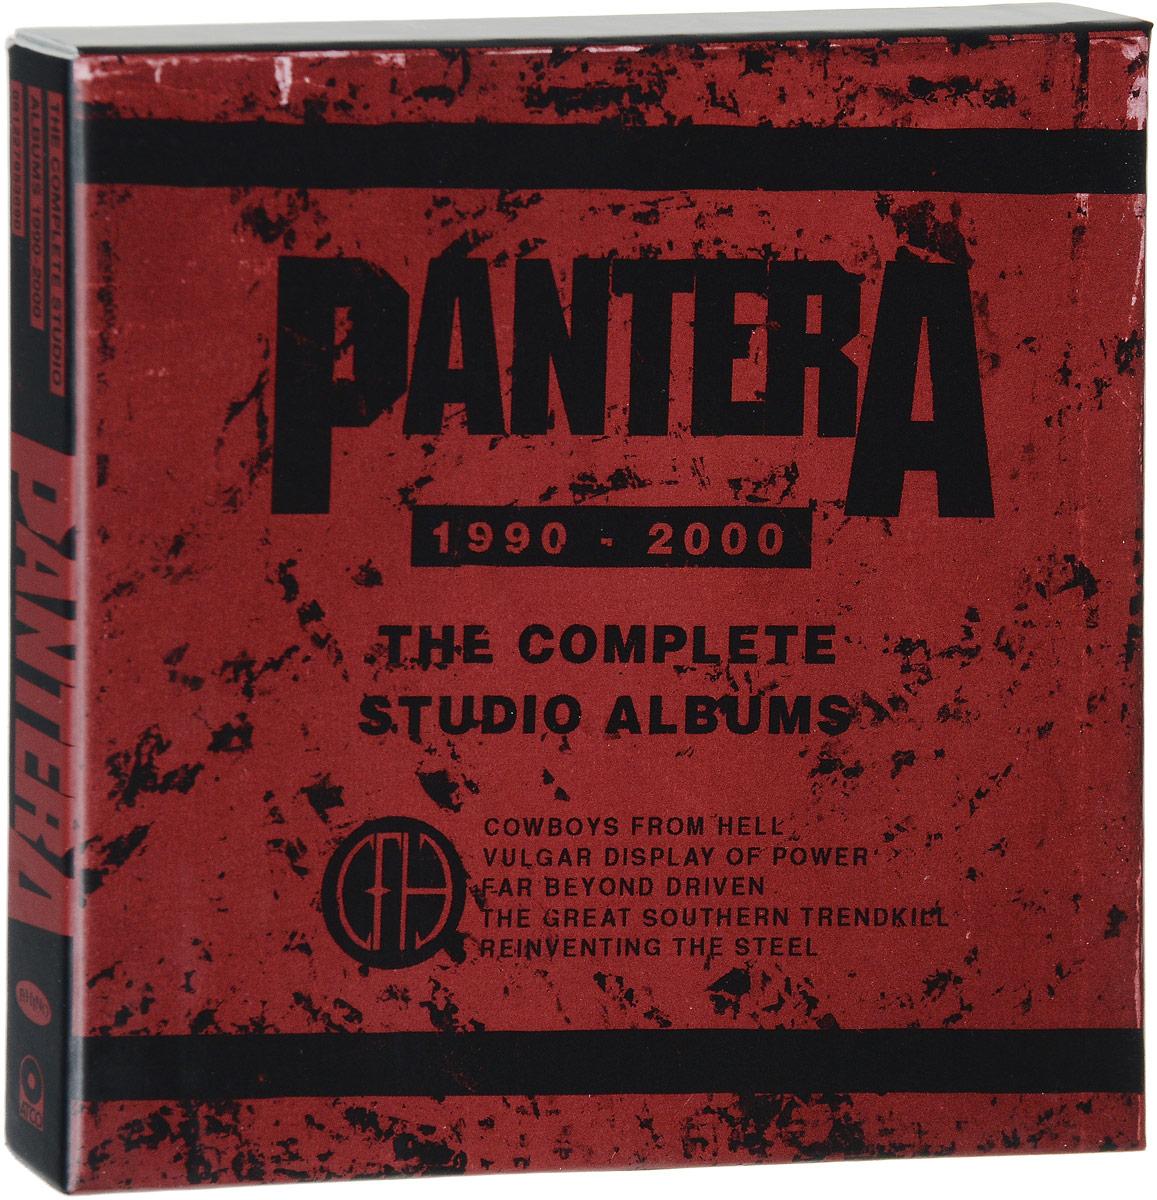 Pantera Pantera. The Complete Studio Albums 1990-2000 (5 CD) pantera pantera the great southern trendkill 2 lp 180 gr